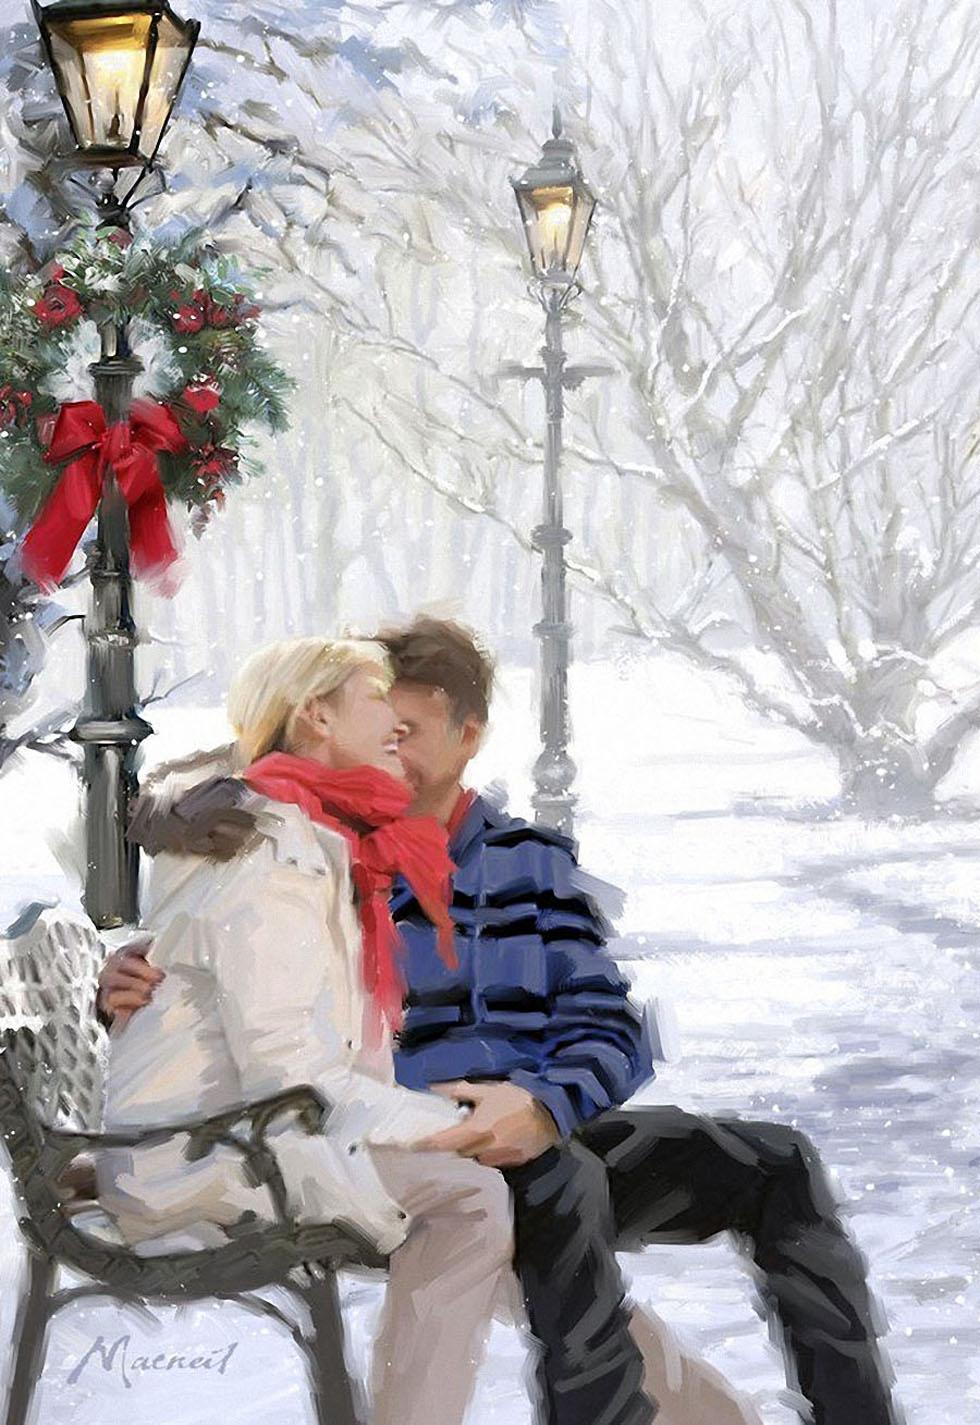 Couple-On-Snowybench-Print-The-Macneil-Studio.jpg